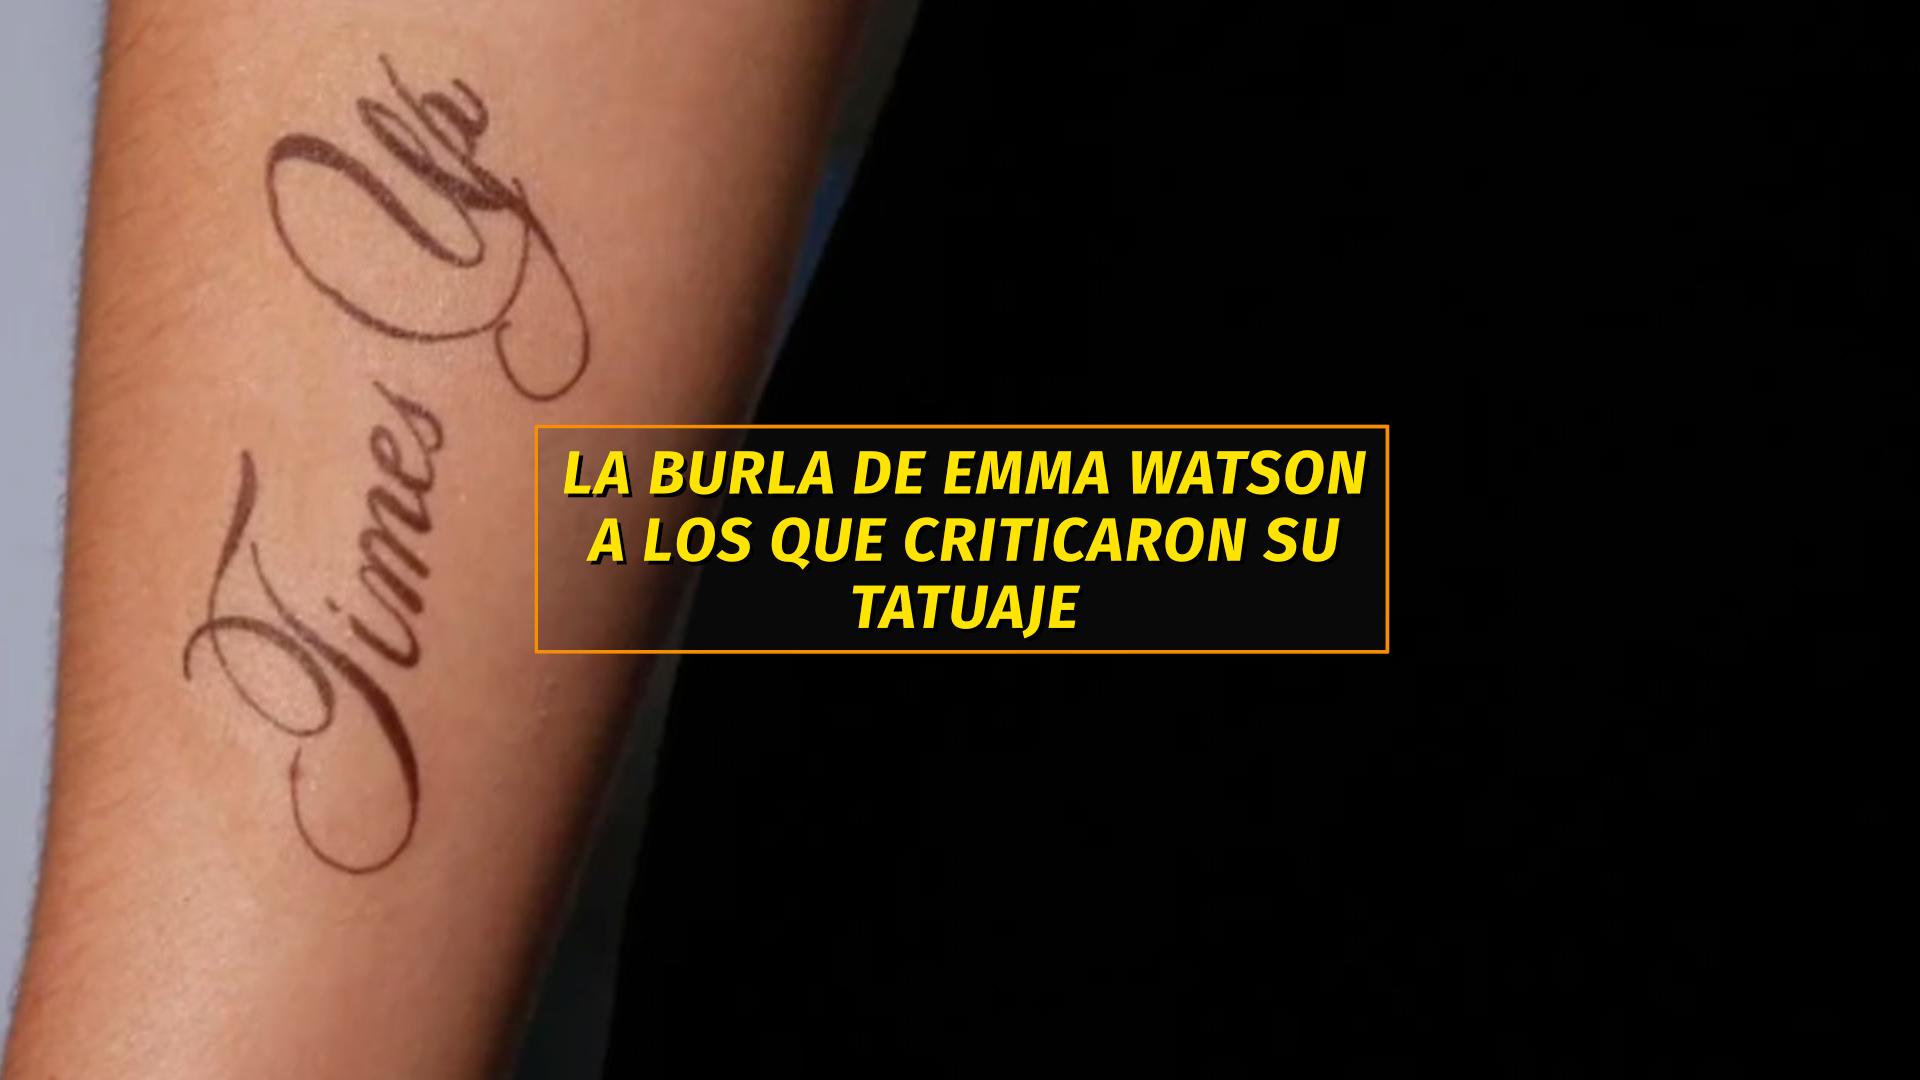 Tipos De Letras Elegantes Para Tatuajes Primitivelifepw